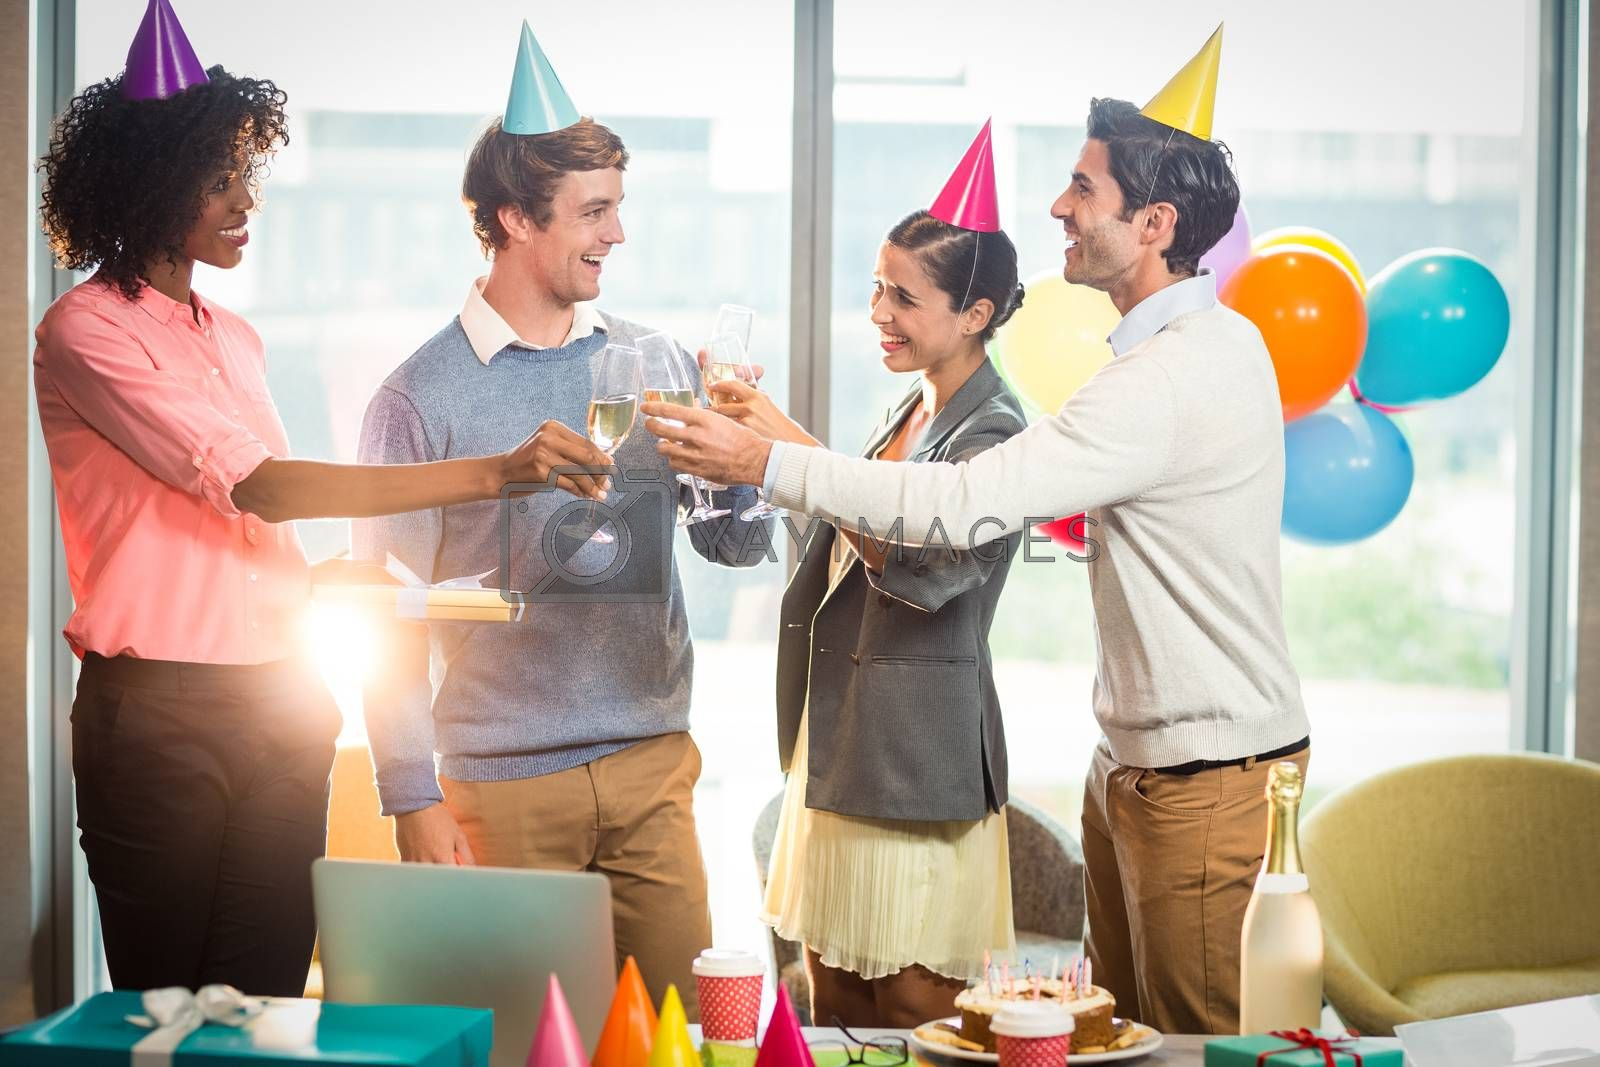 Business people celebrating birthday by Wavebreakmedia